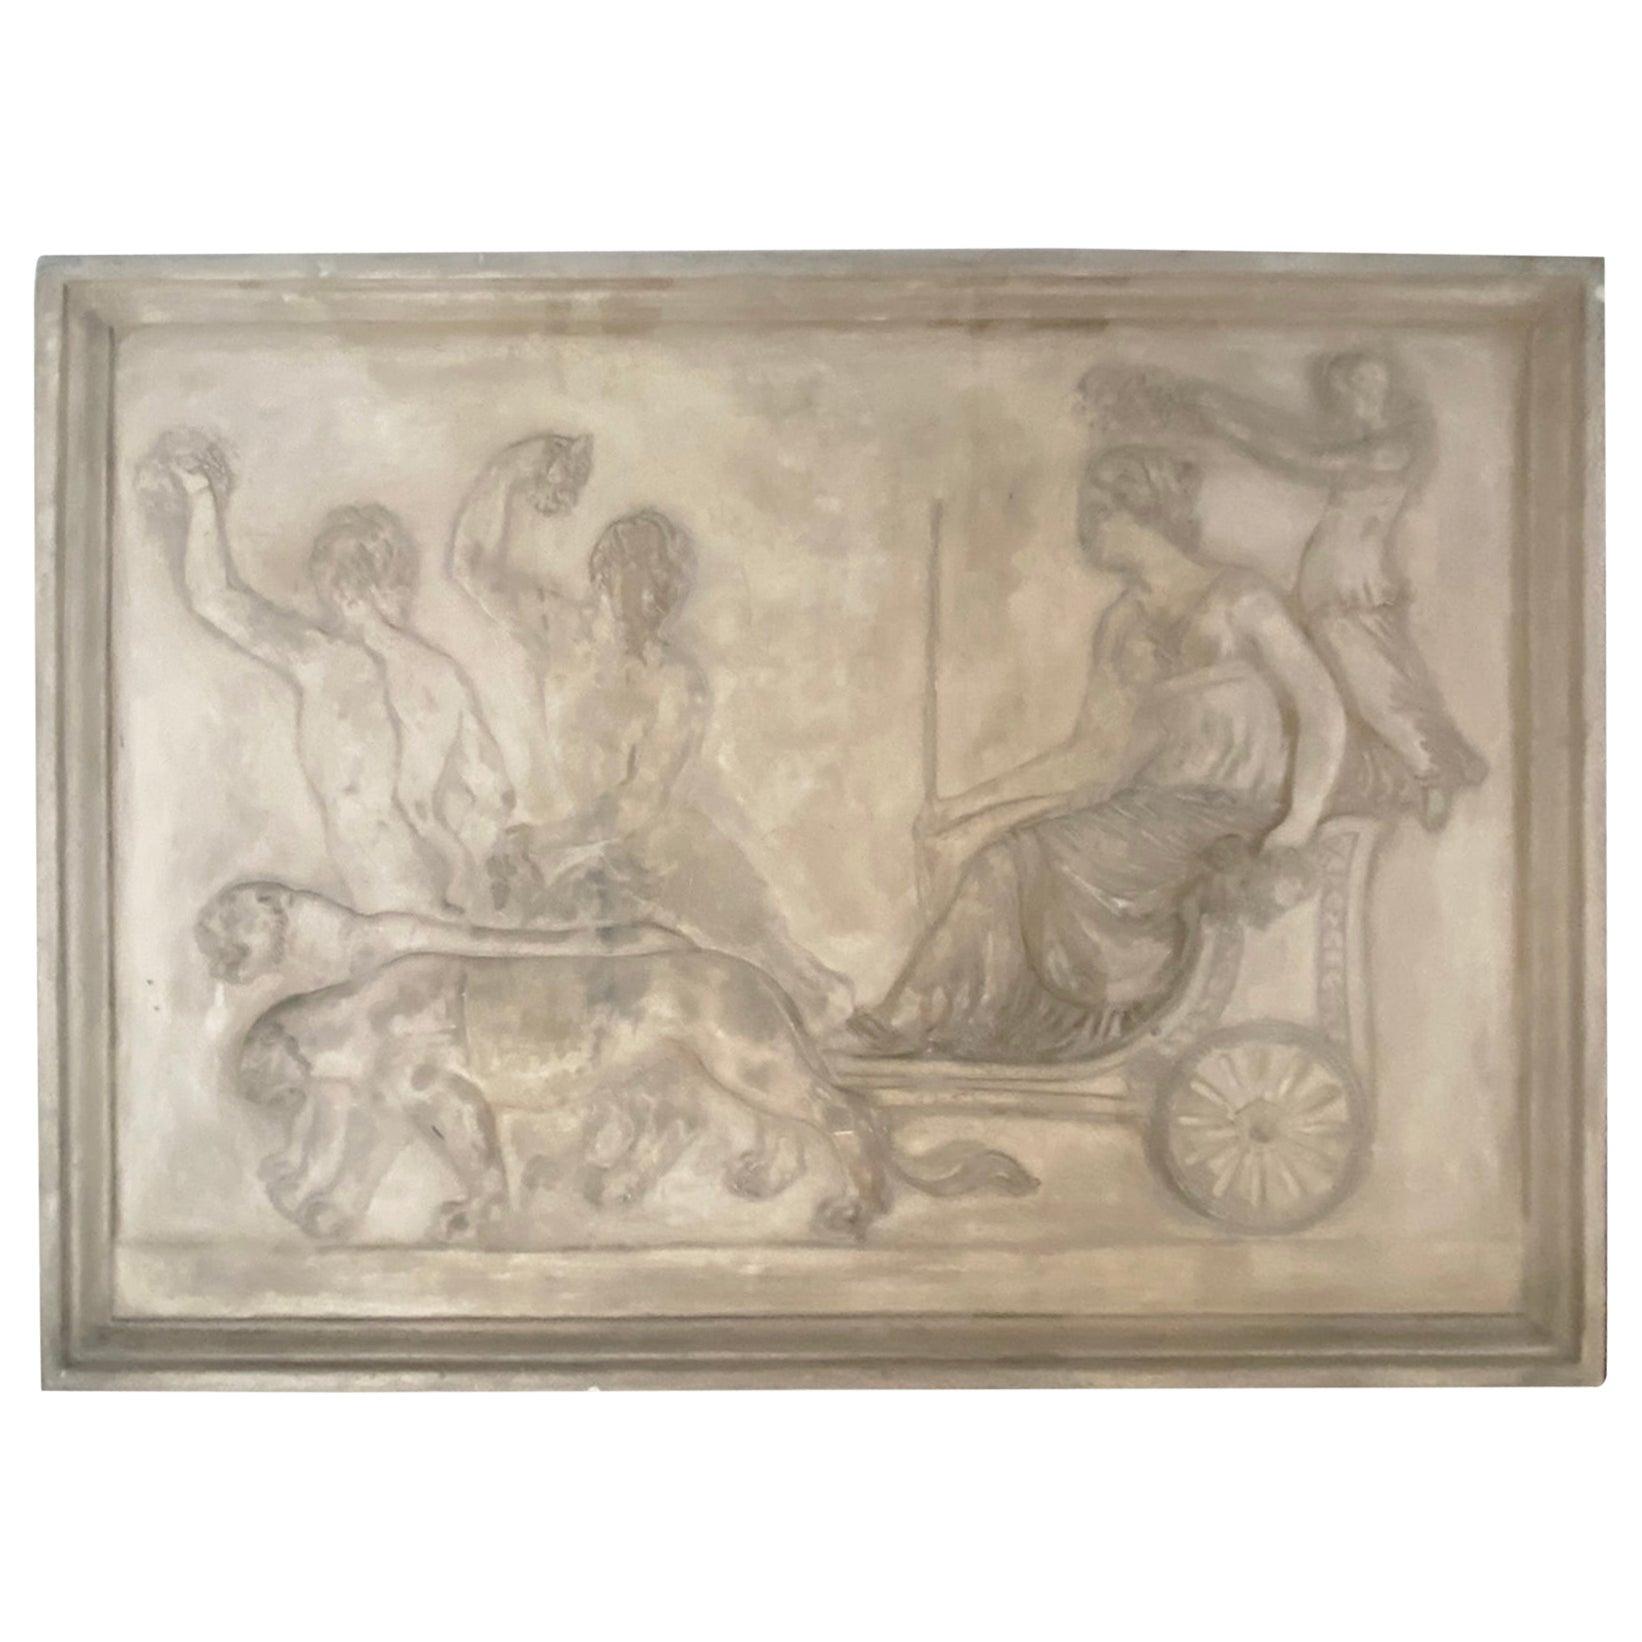 Architectural Terra-cotta Bas Relief Sculpture Plaques Italian Terracotta